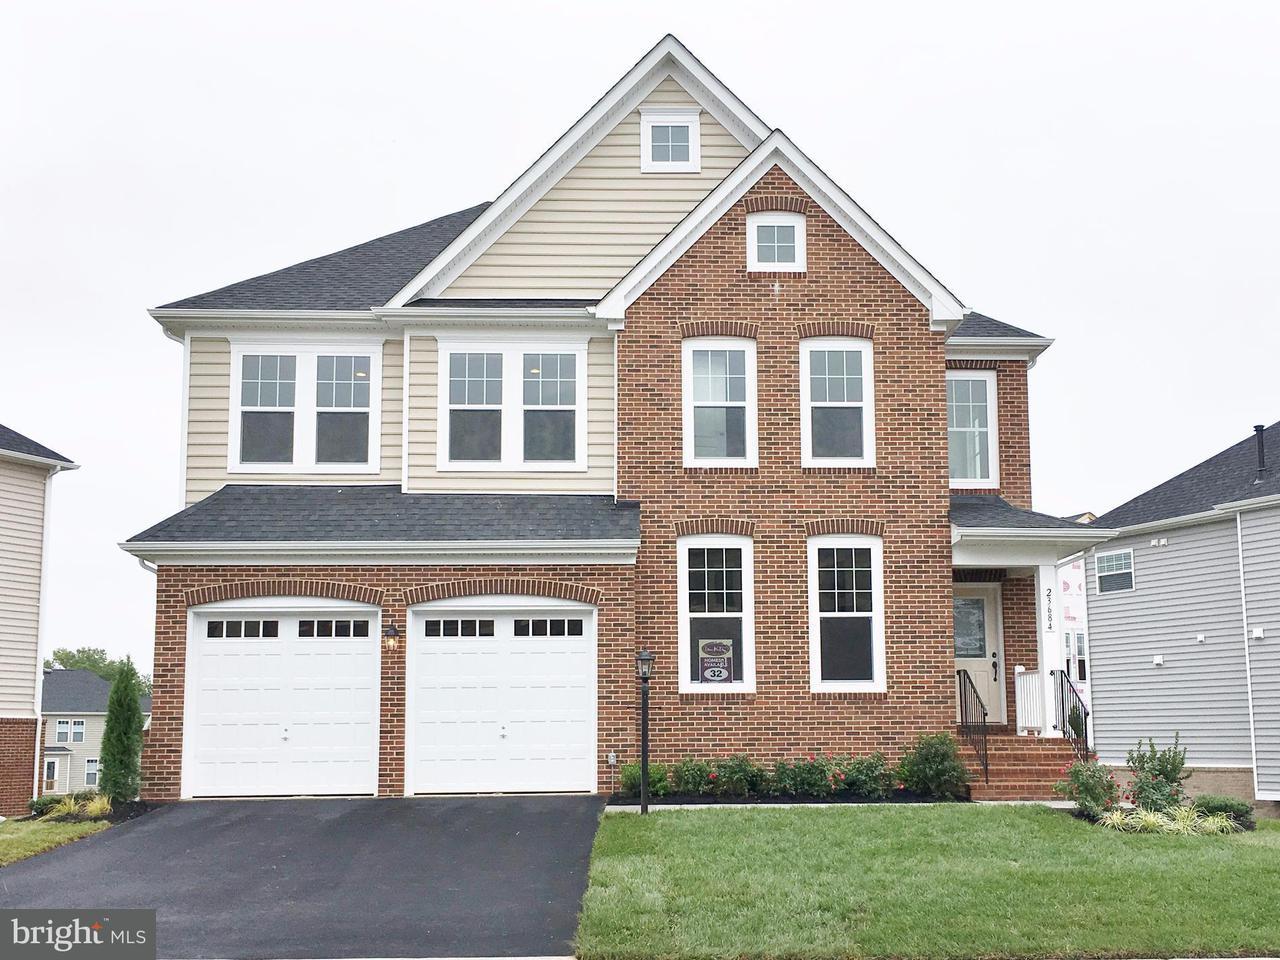 独户住宅 为 销售 在 23684 EVERMONT TRACE DR N 23684 EVERMONT TRACE DR N Brambleton, 弗吉尼亚州 20148 美国